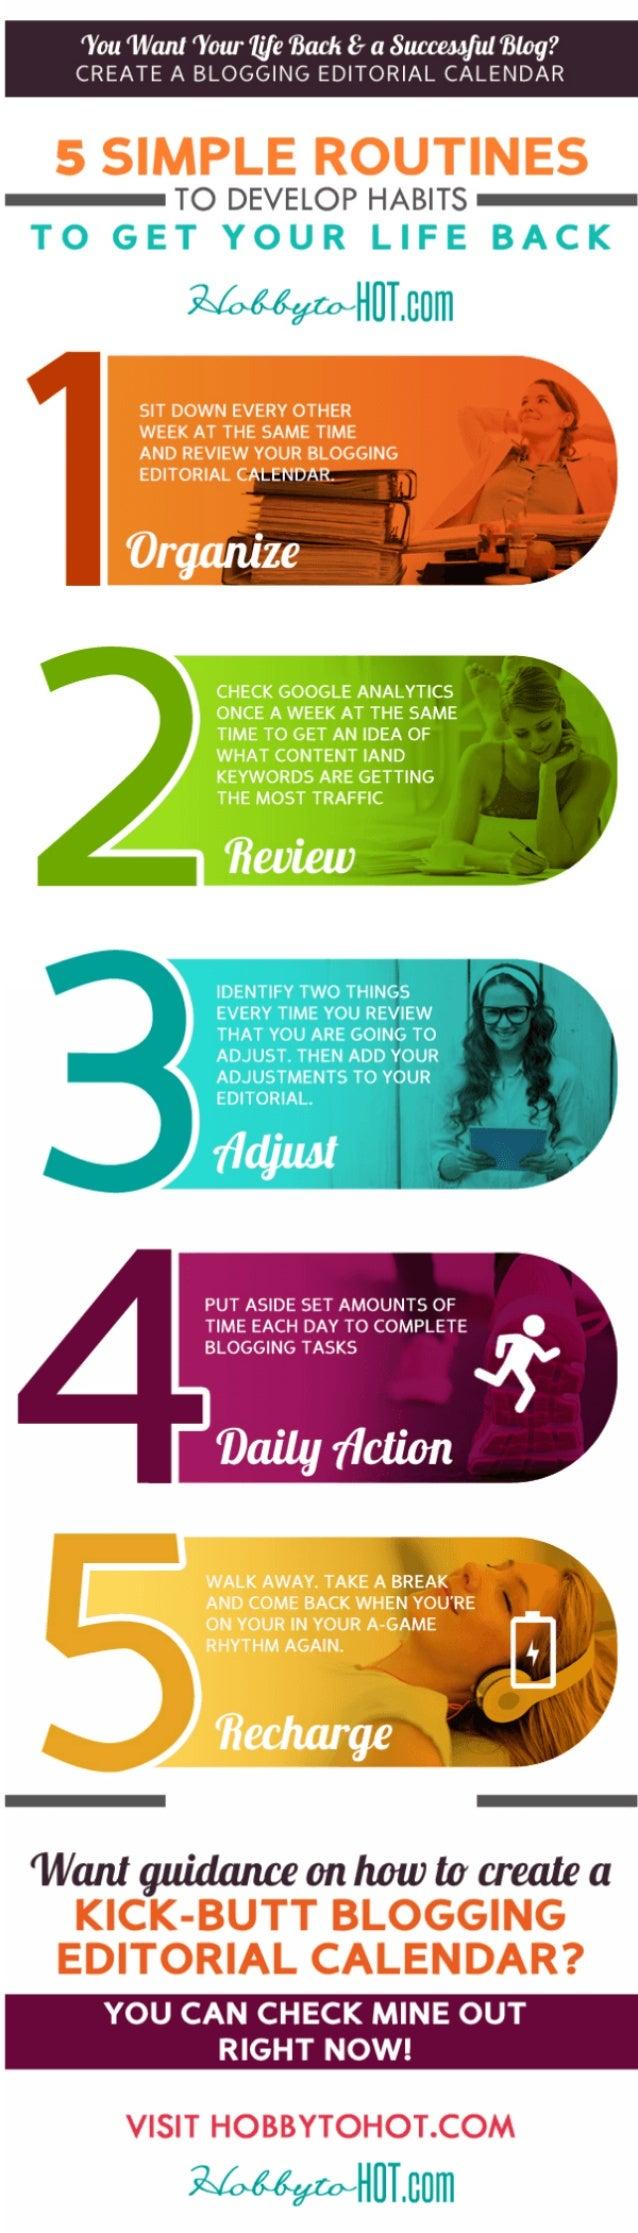 5 Simple Steps to Balance Blogging AND Your Life!  HobbytoHOT.com #bloggingtips #blog